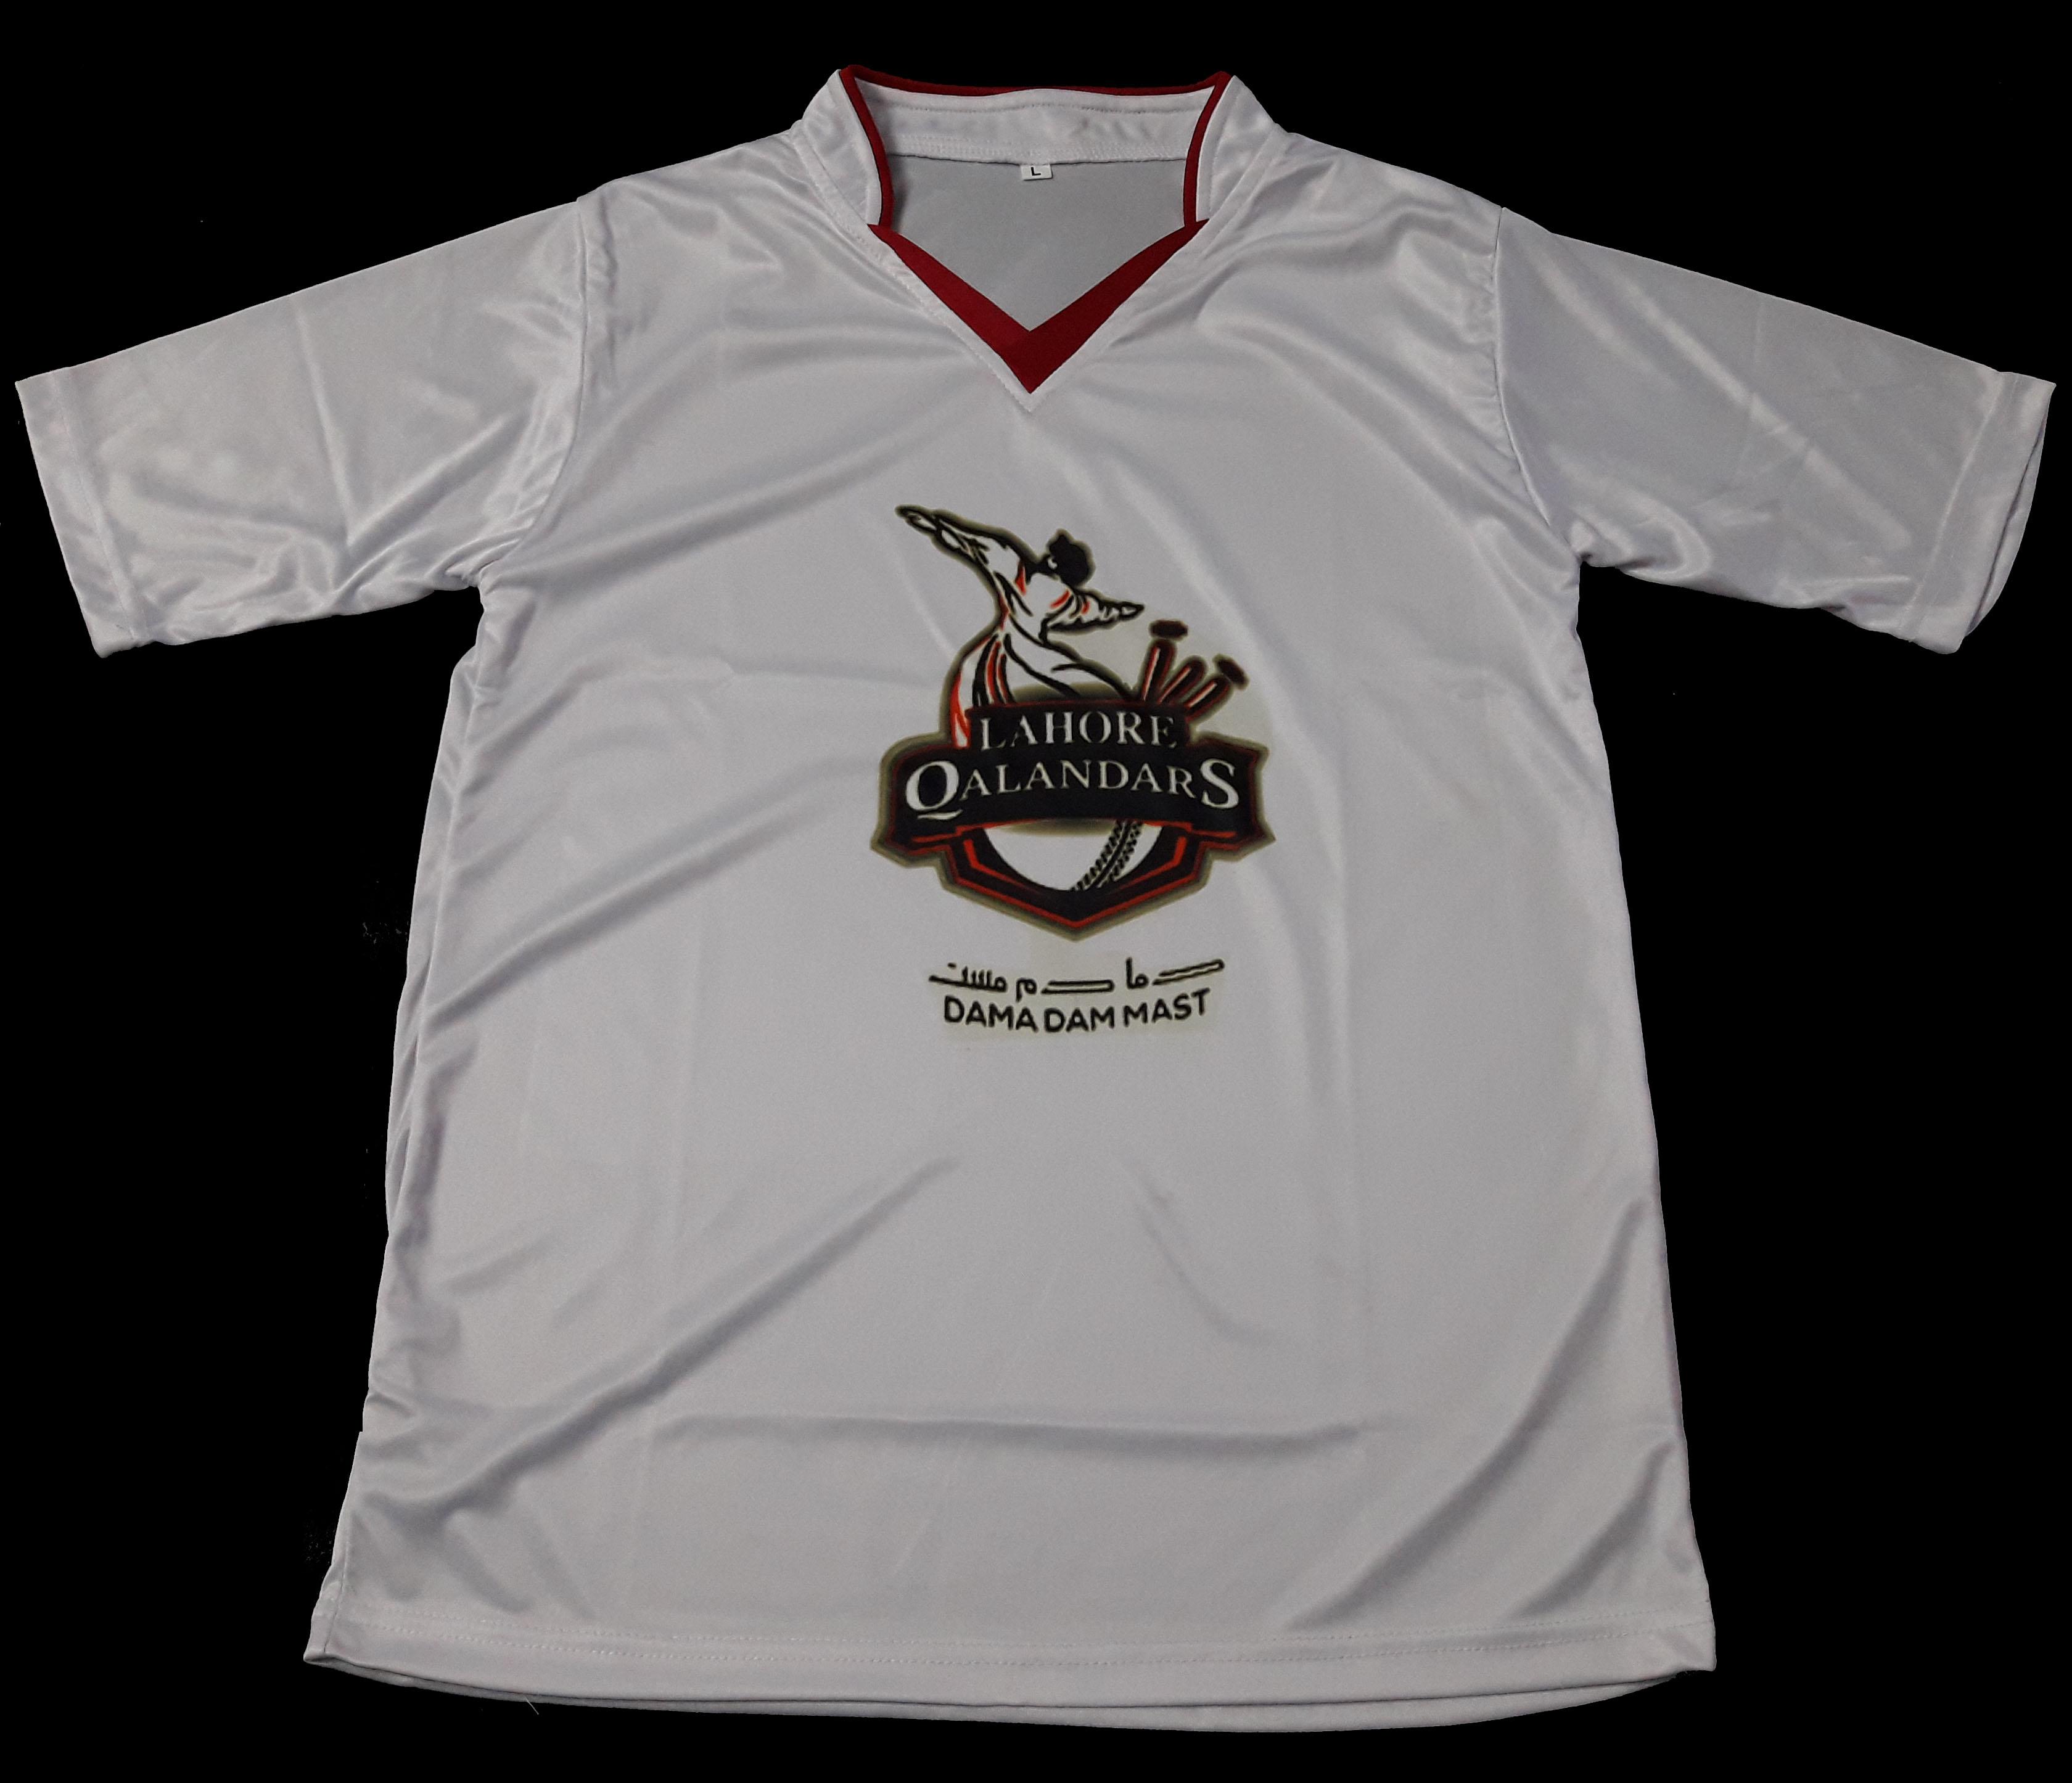 lahore qalandars shirts gentryhive